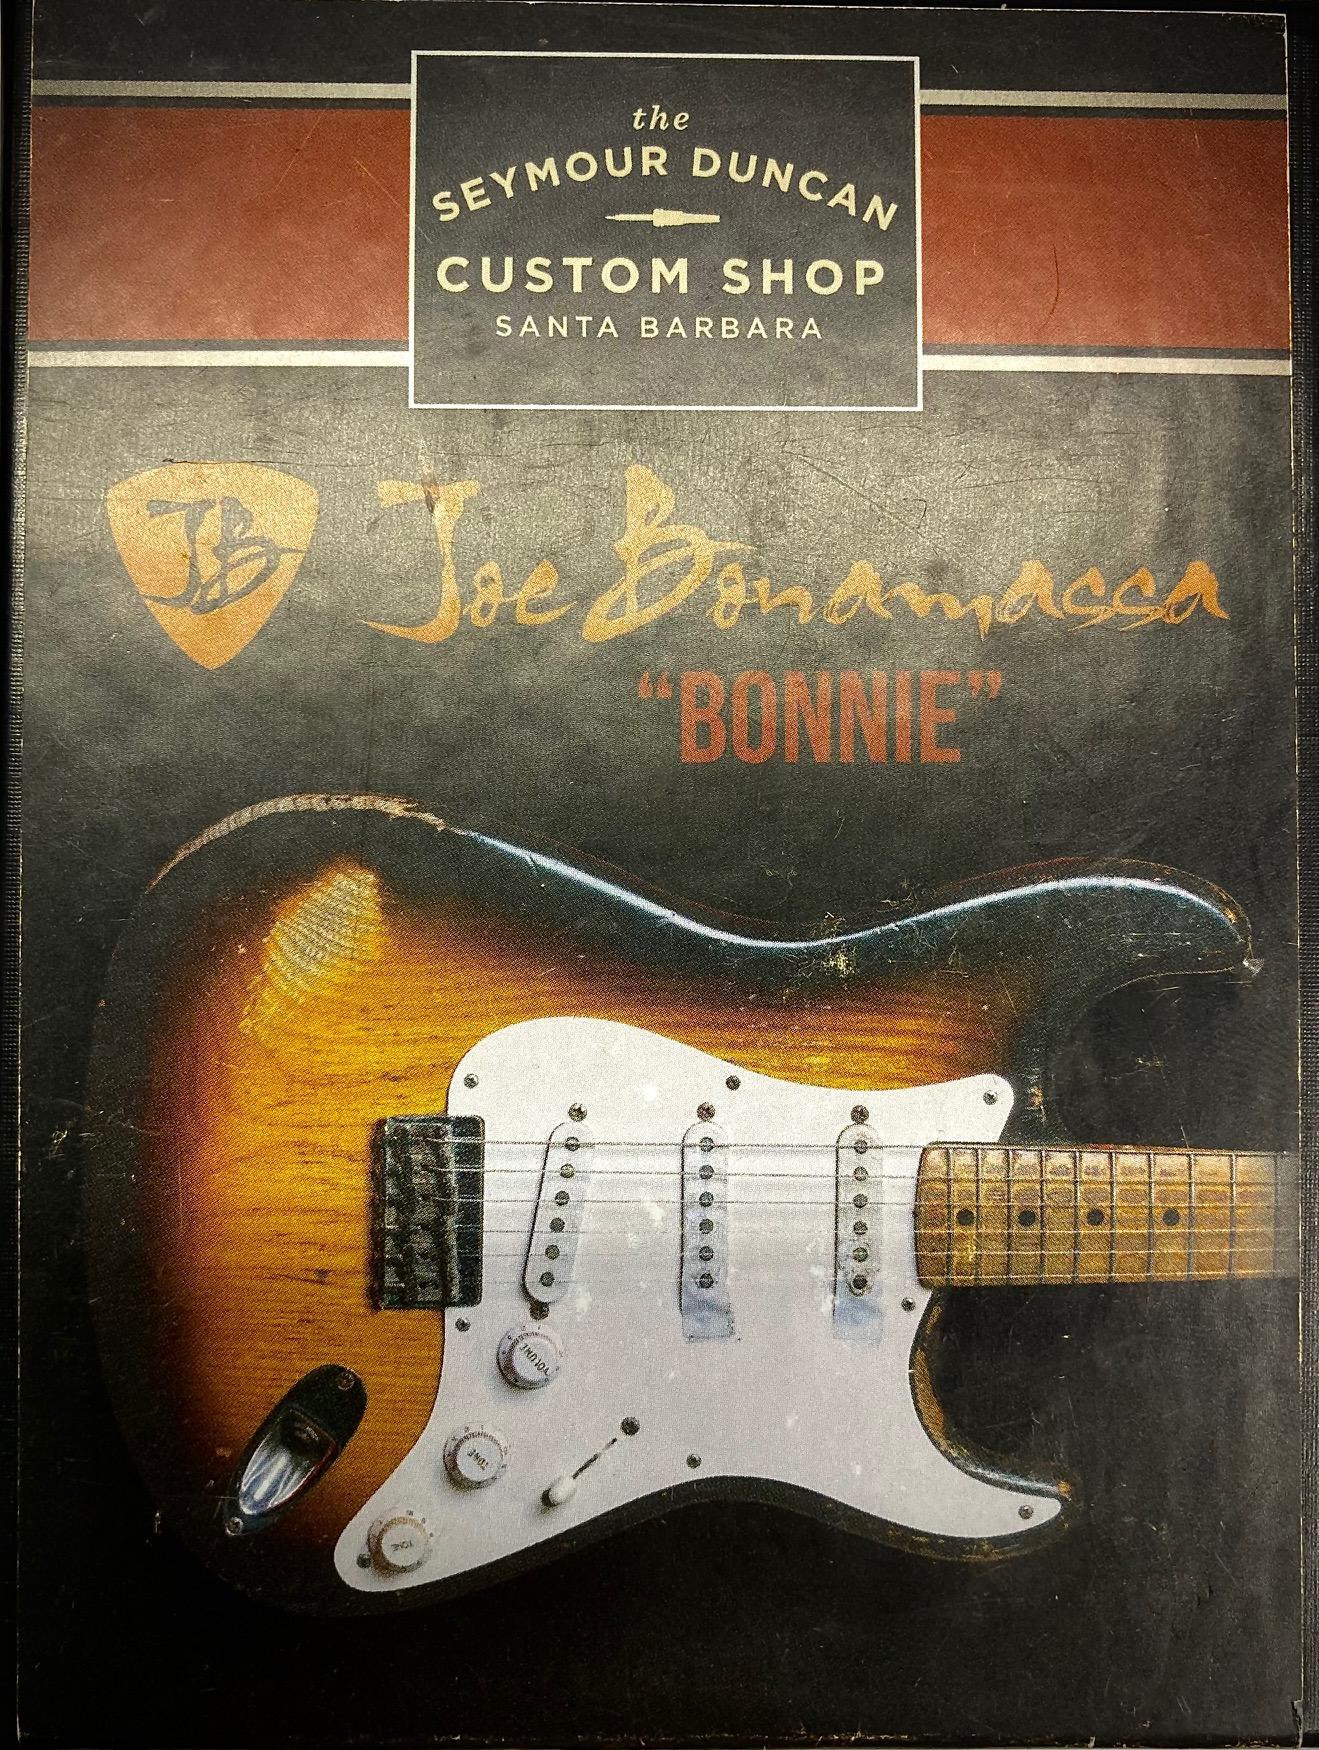 Seymour Duncan Joe Bonamassa Signature Bonnie Strat - Pickup Set - Non-Aged White